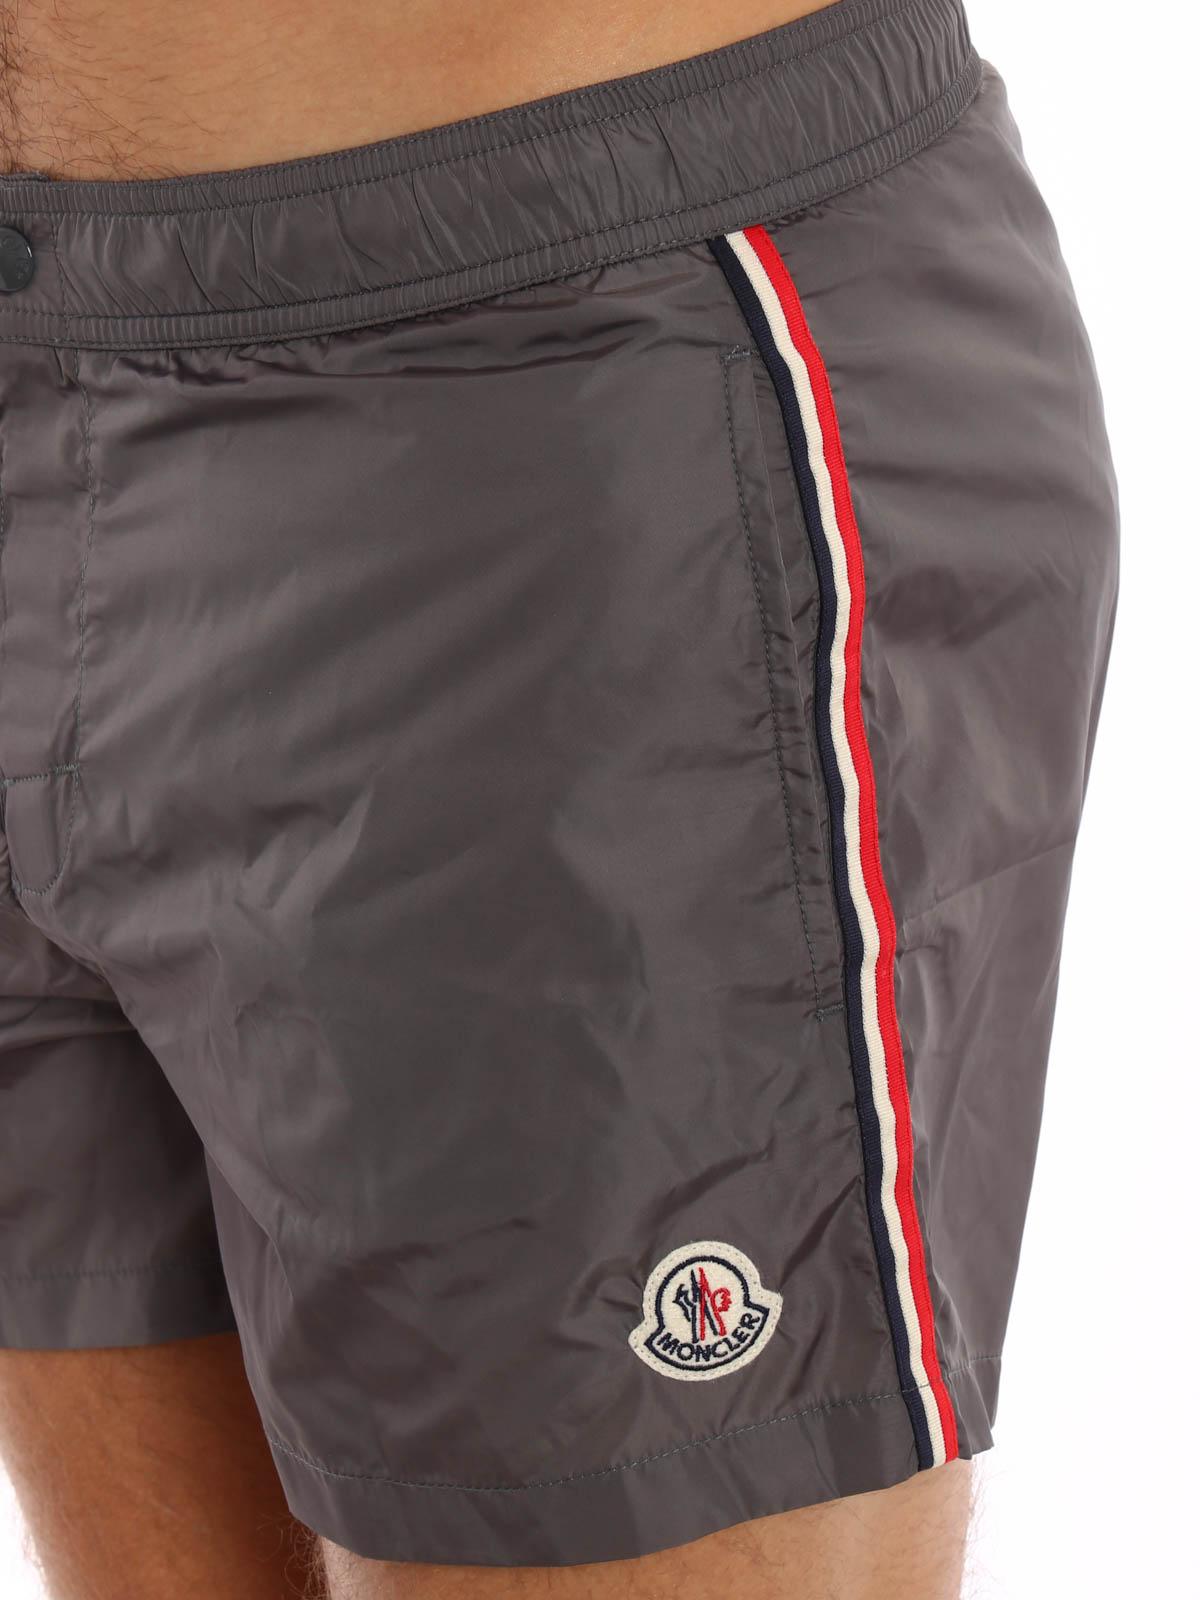 52dfd4254 Moncler - Swim shorts - Swim shorts & swimming trunks - B1 091 ...